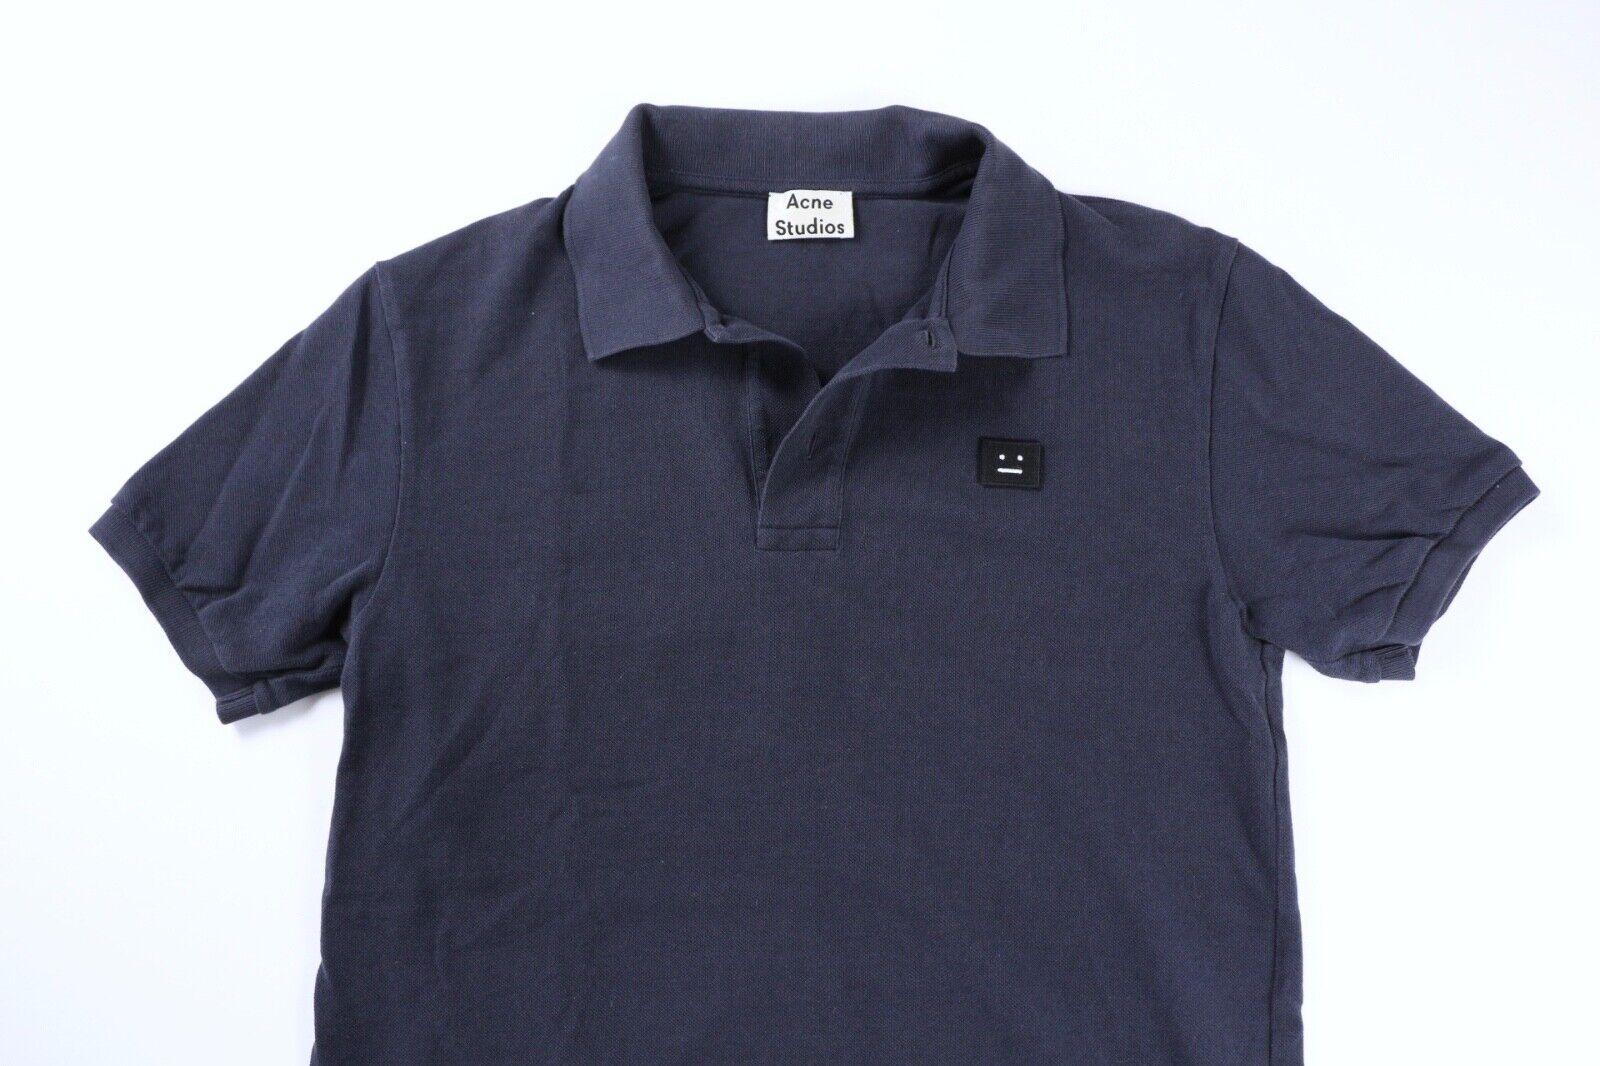 Acne Studios Mens Navy bluee Kolby Face Polo Shirt Medium fits Small